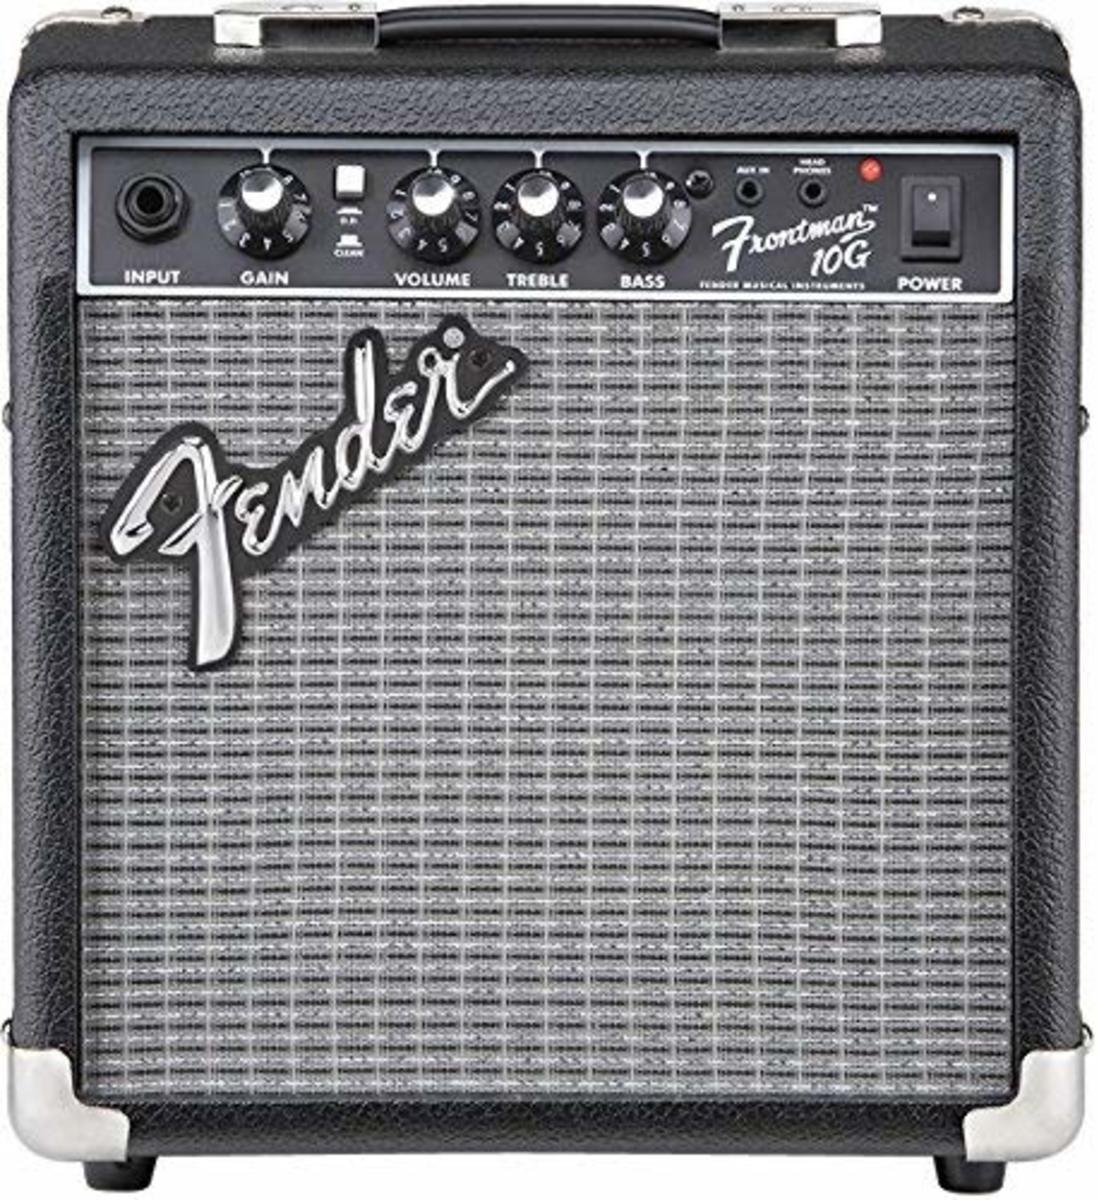 Fender Frontman 10 Guitar Amp